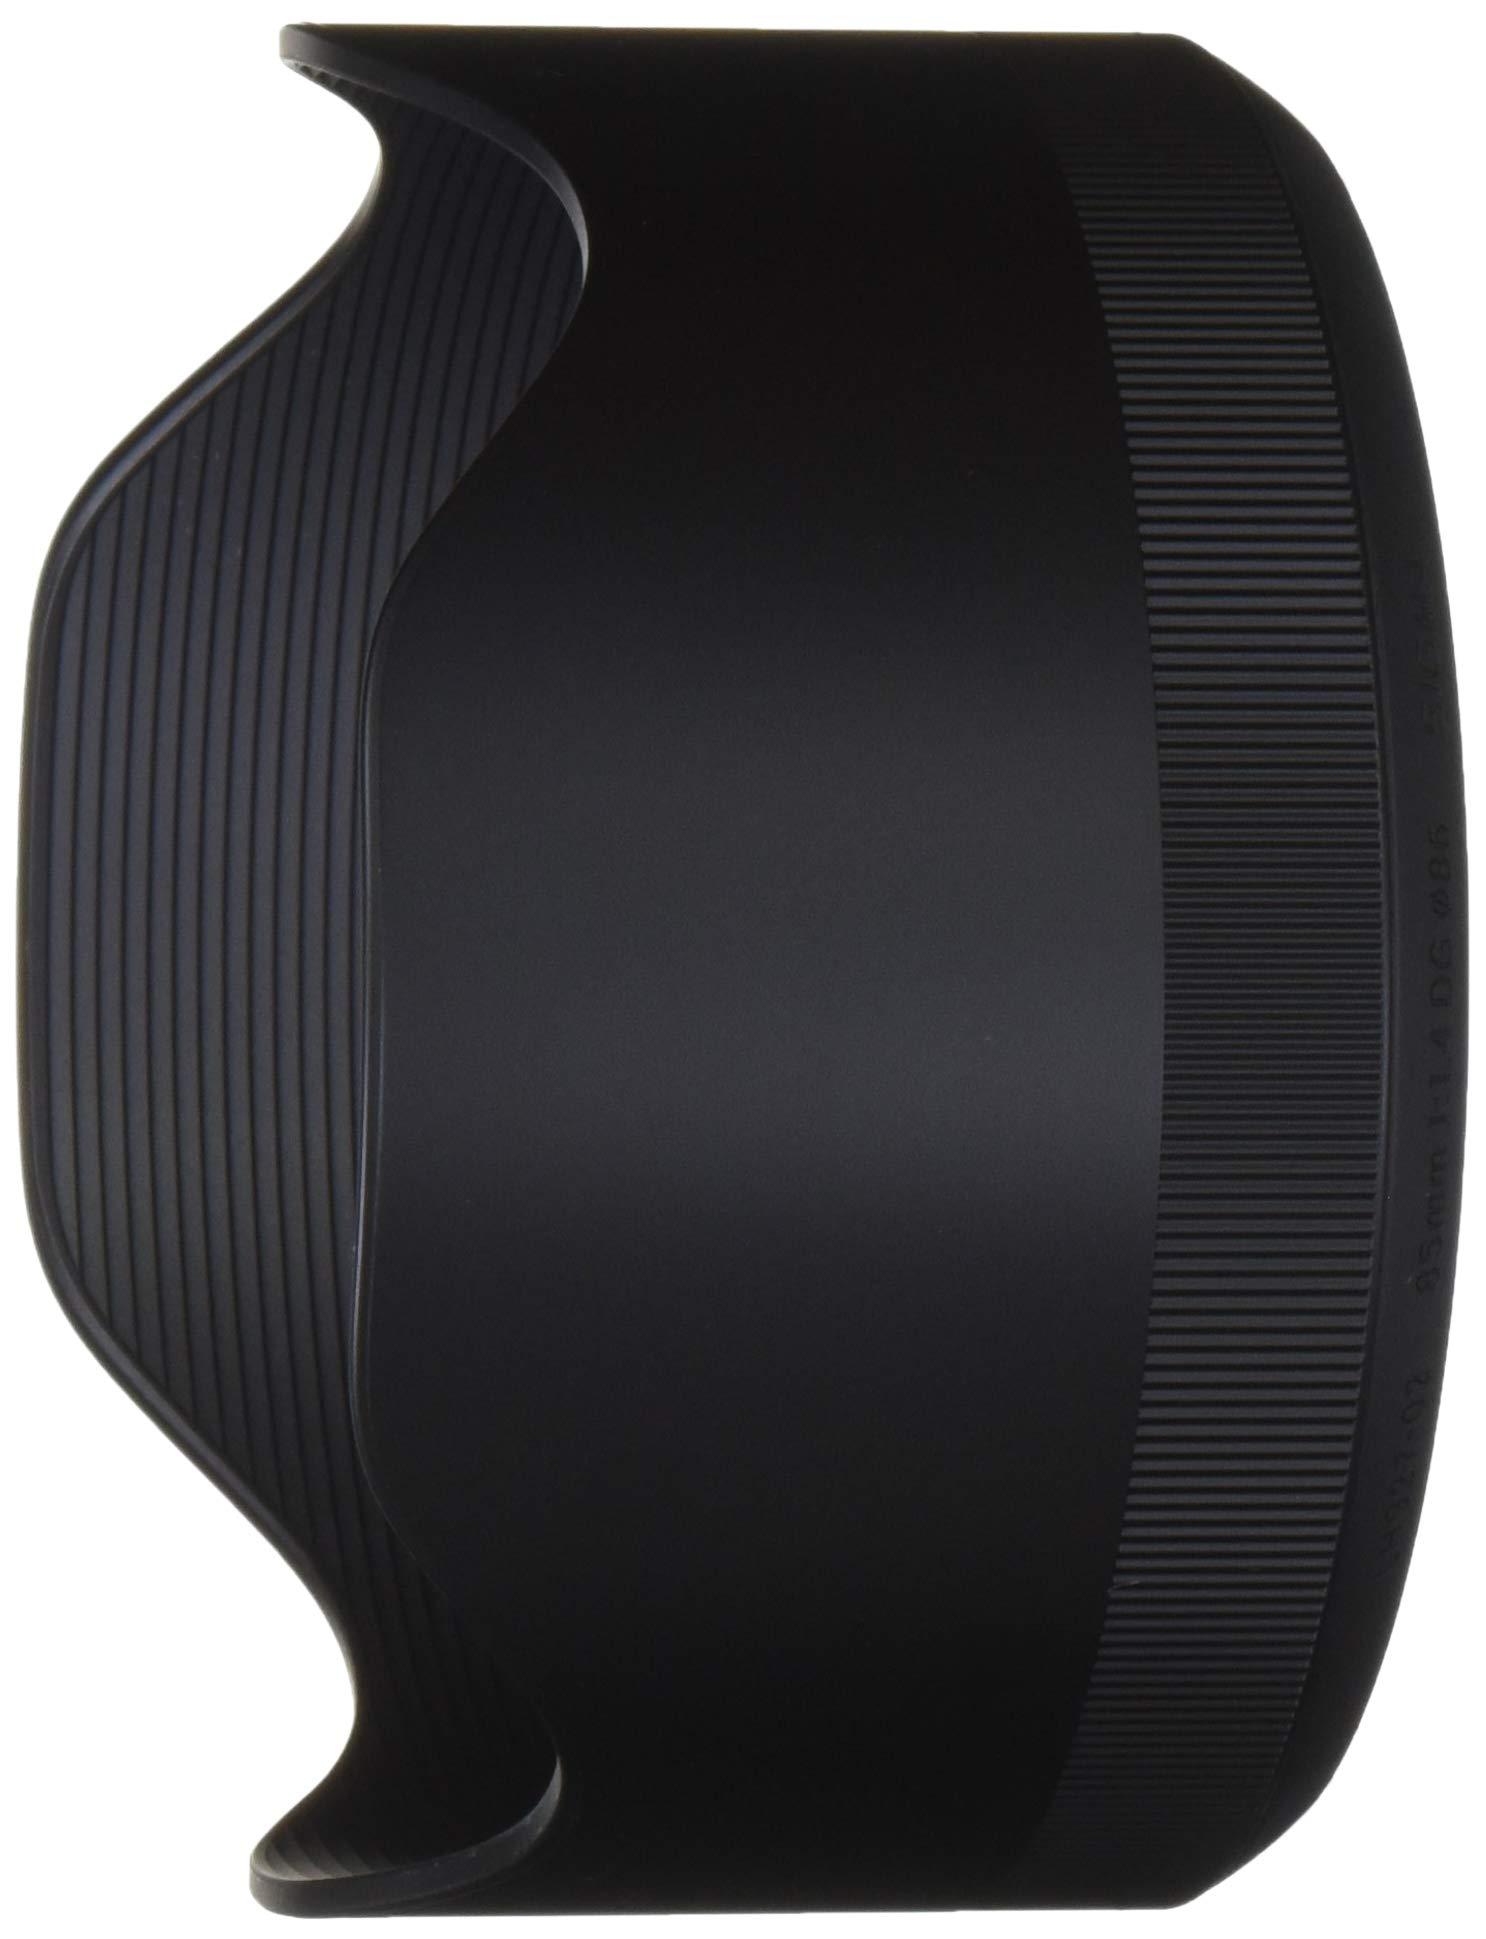 SIGMA lens hood LH830-03 931346